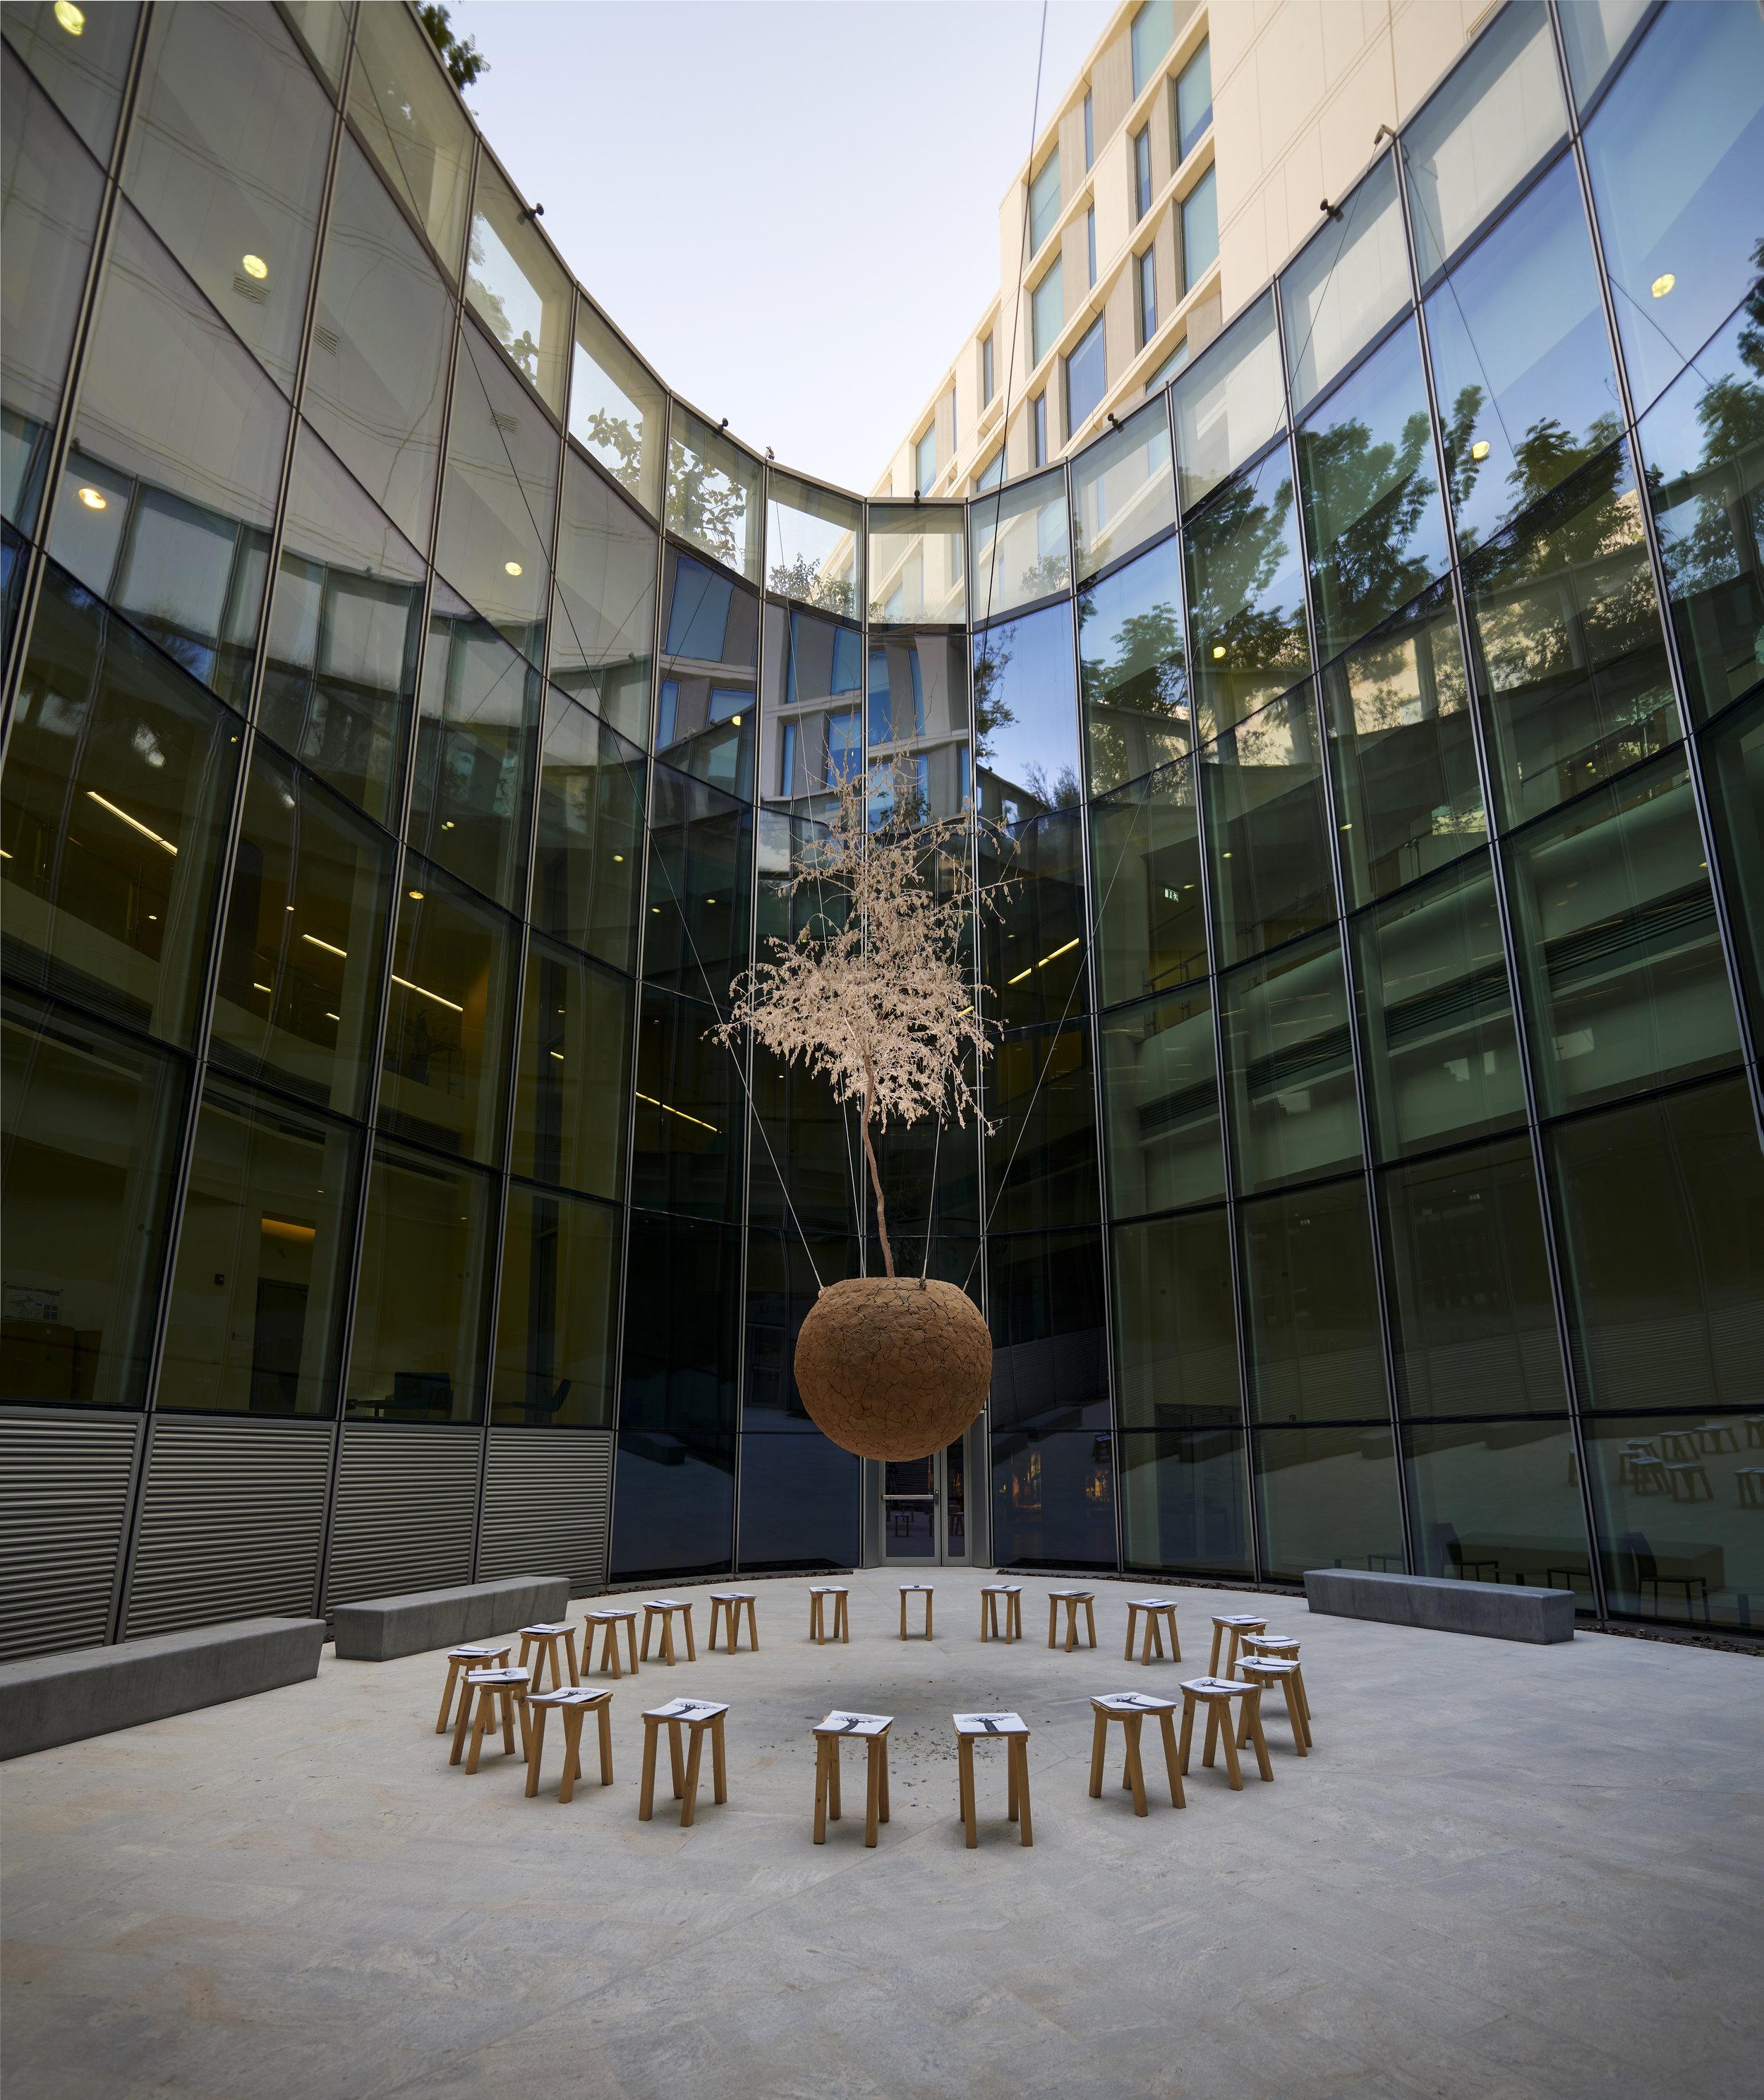 Sandi Hilal and Alessandro Petti. Mujawara / The Tree School ,2014 – 2018. Stools, Ghaf tree. Courtesy of the Artists and NYU Abu Dhabi Art Gallery. Image by John Varghese